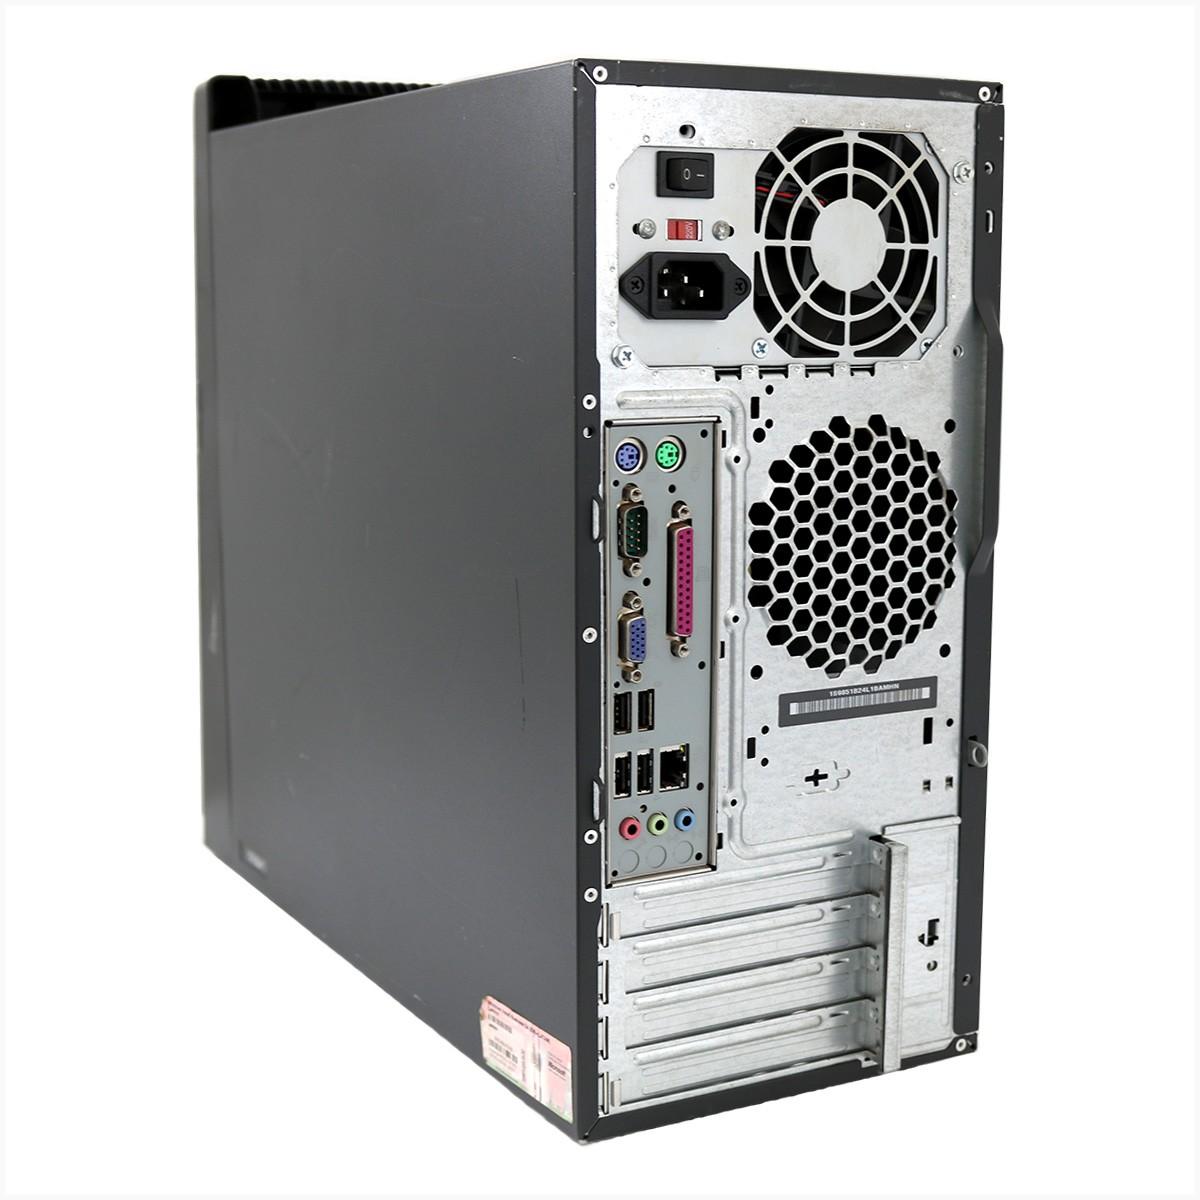 Desktop thinkcentre lenovo a57 slim core2duo 4gb 320gb - usado